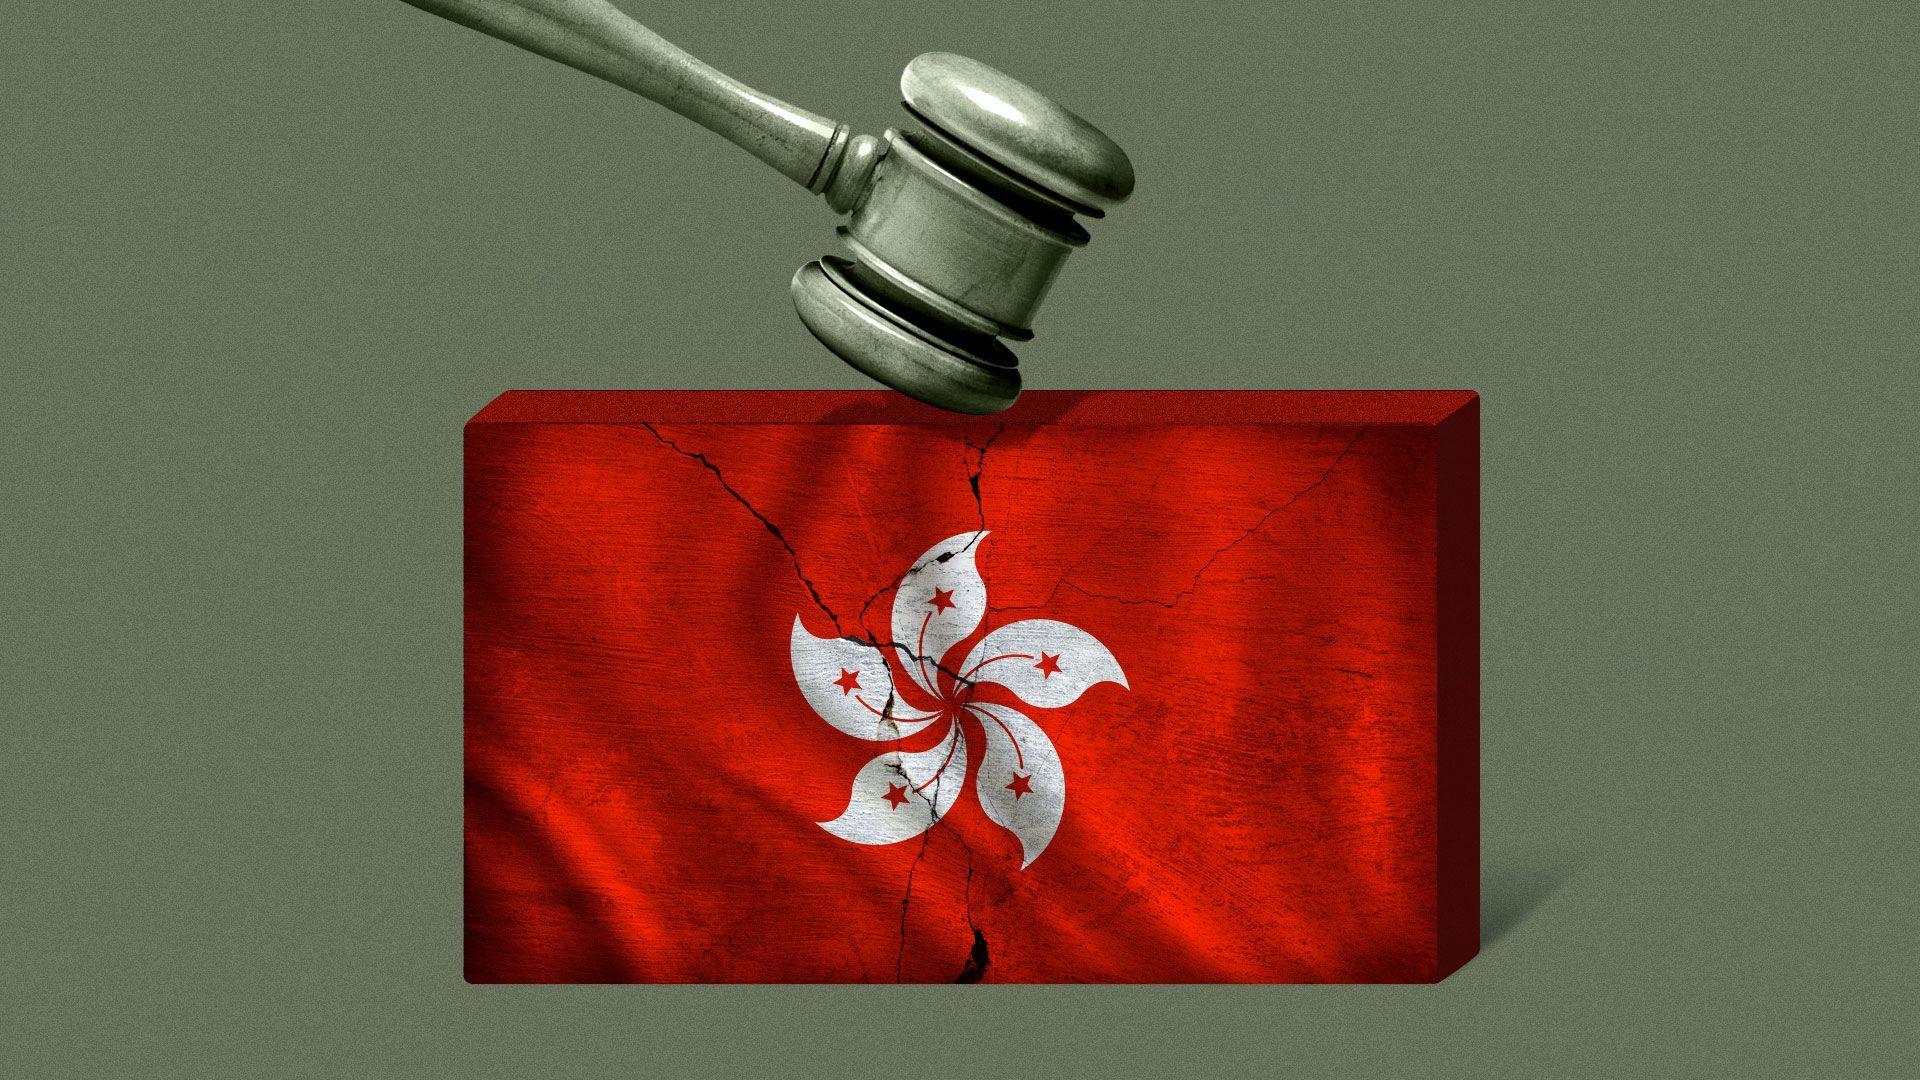 High-profile Hong Kong activists face trial